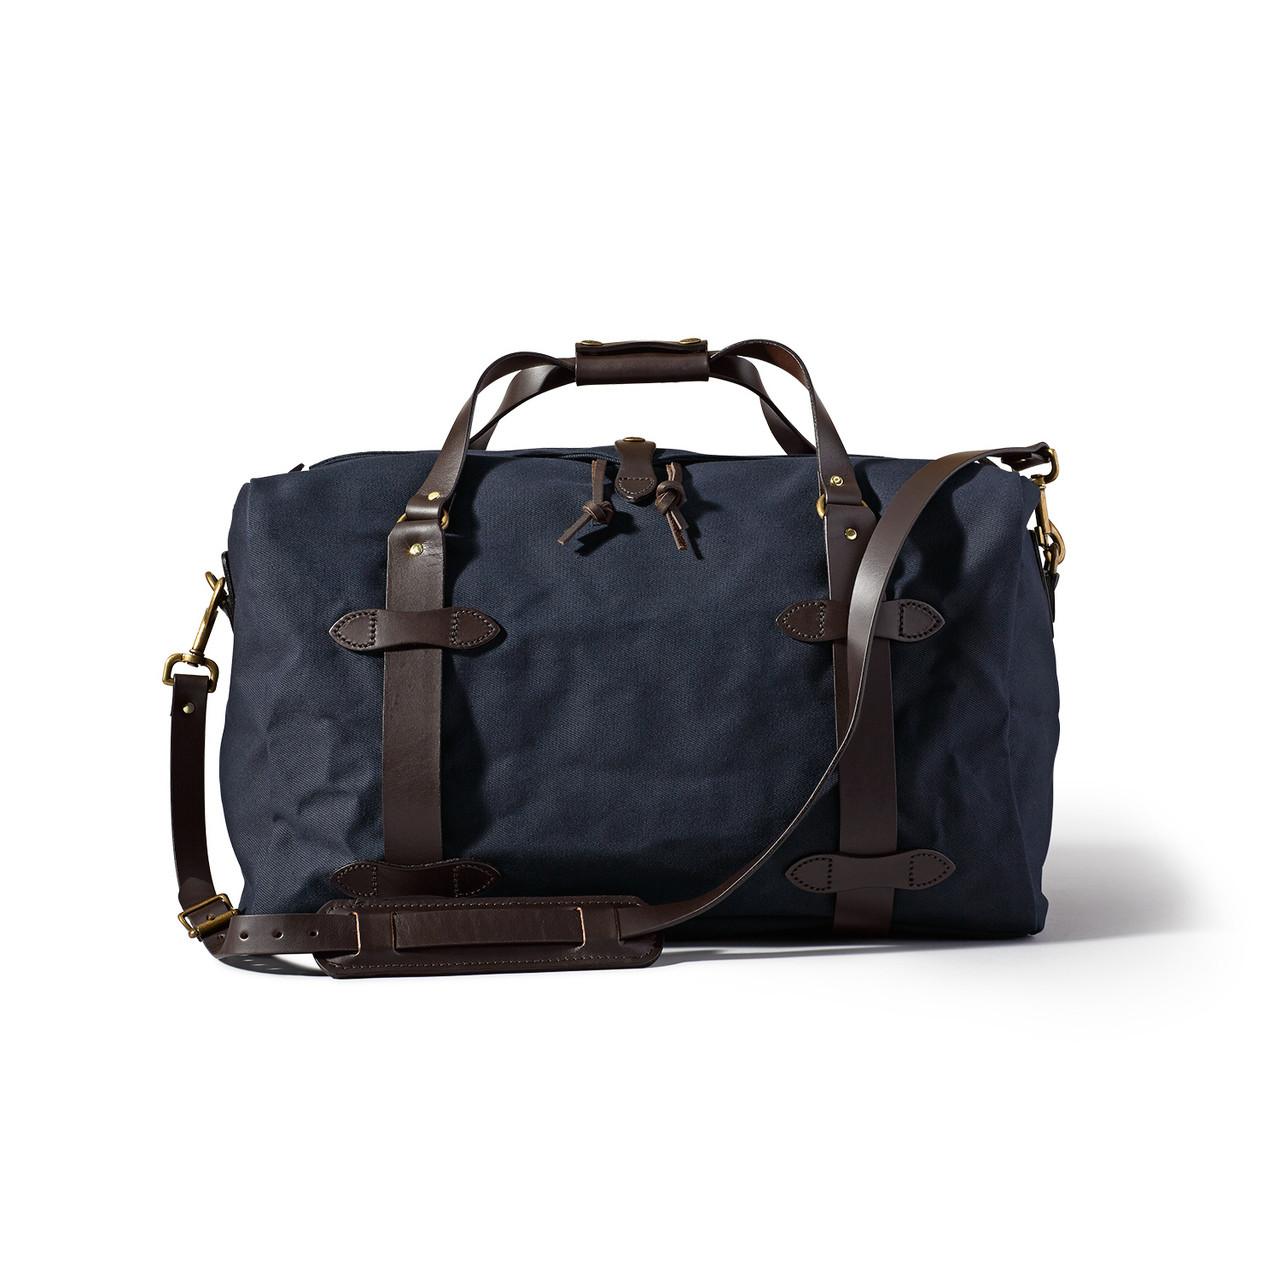 43af4e680299 Filson Small Duffle Bag - Navy - Craig Reagin Clothiers